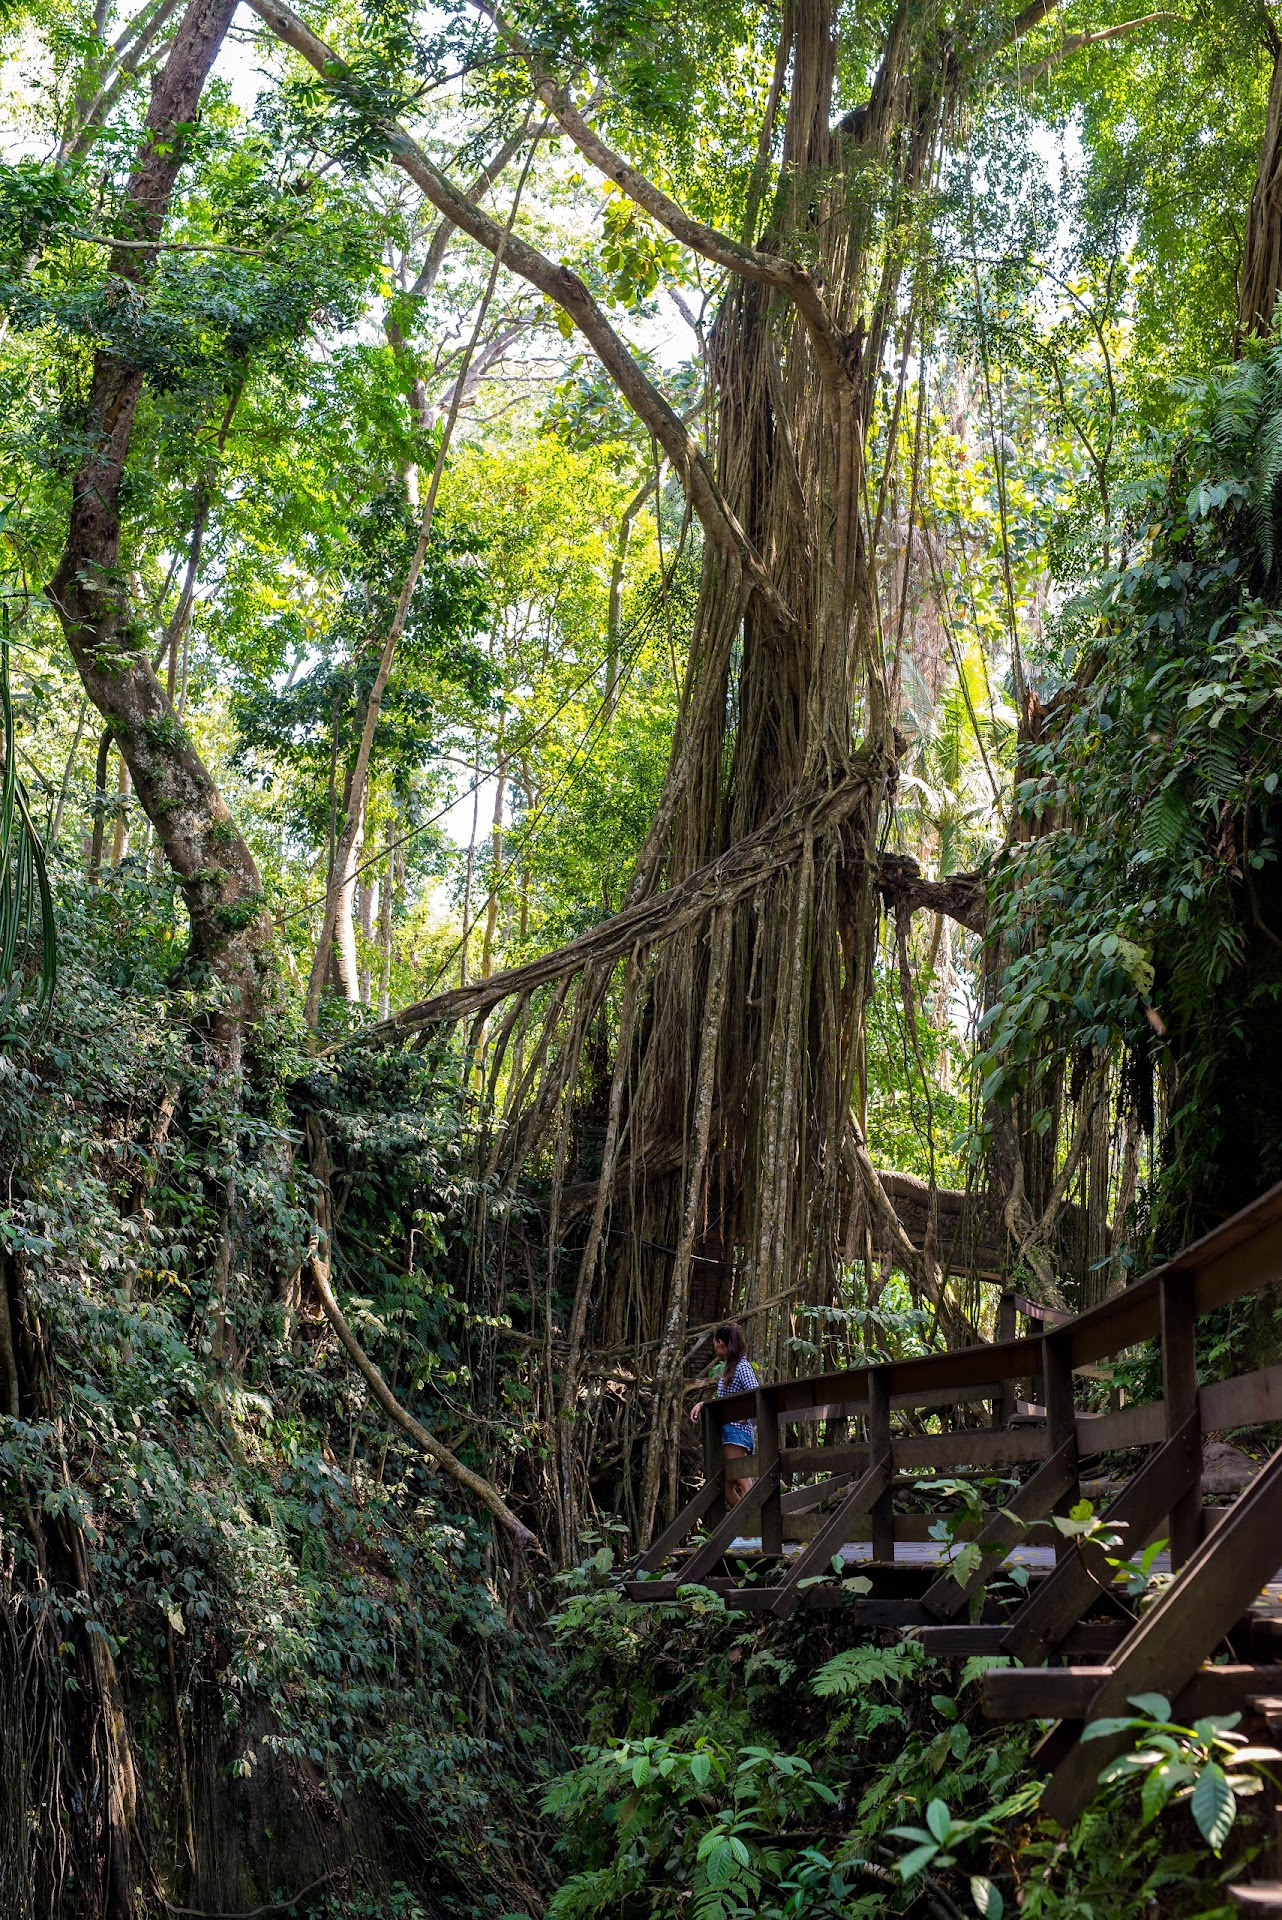 jungle, travel blog, bali ubud, monkey sanctuary, nature landscape photography, photographer california san francisco bay area, travel blogger, southeast asia, couple bloggers, bali attractions, things to do